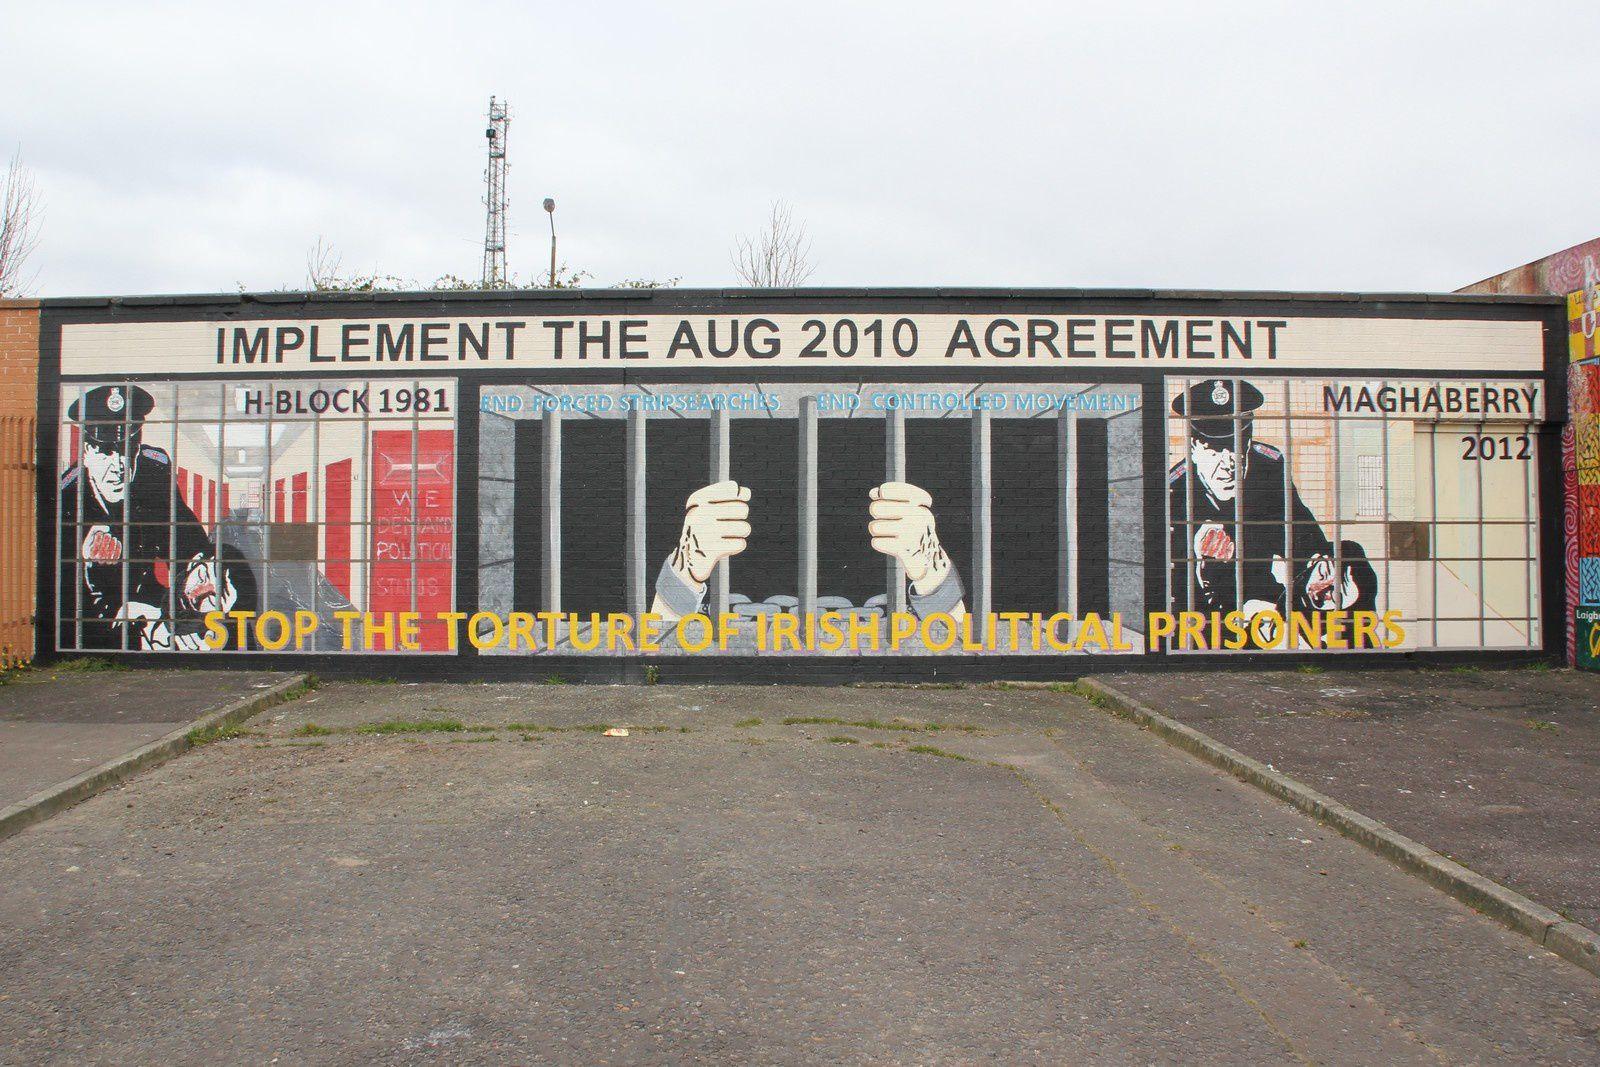 478) Springhill Avenue, West Belfast